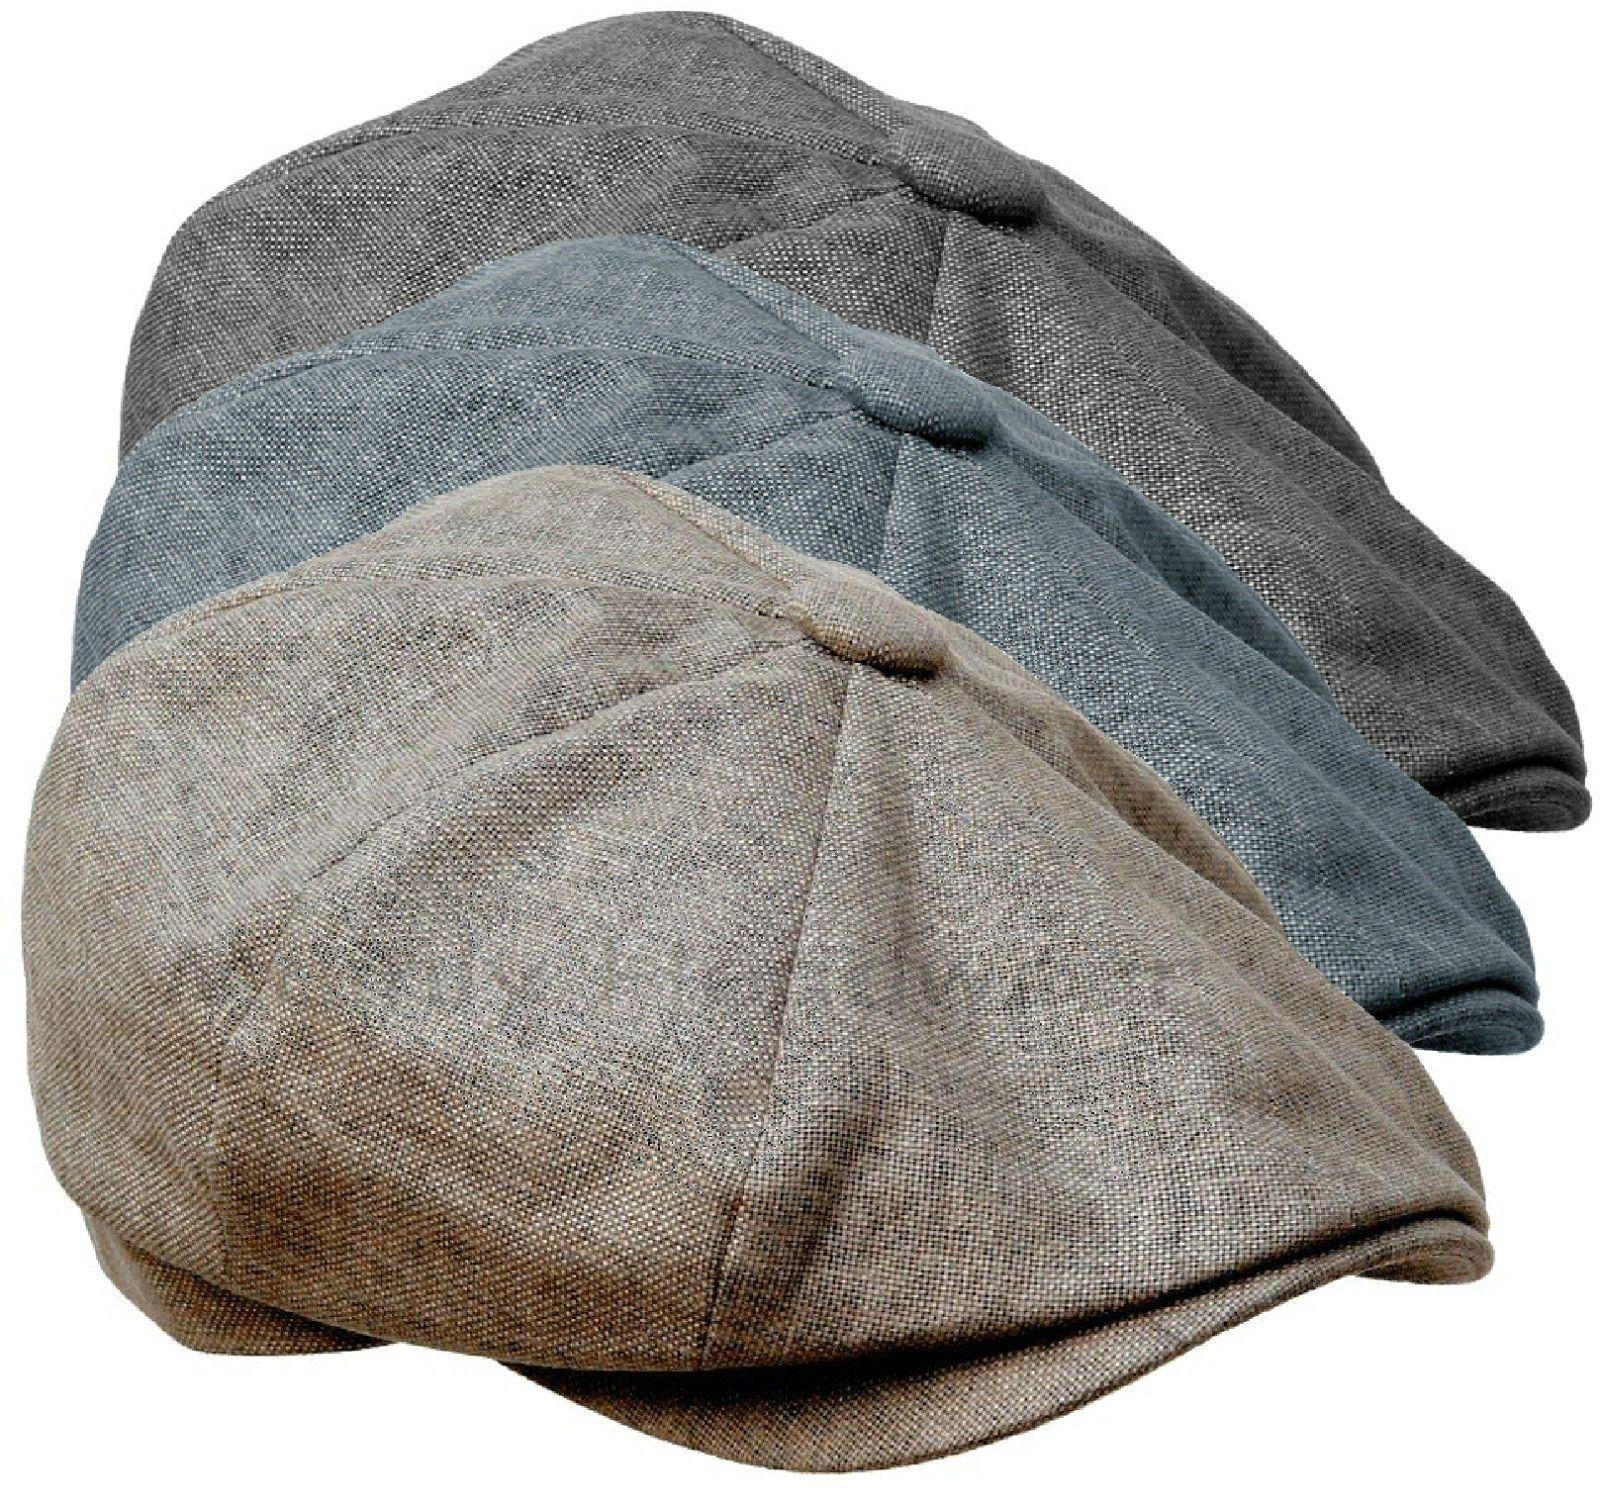 Cotton linensboy cap gatsby men 84 ivy hat golf driving